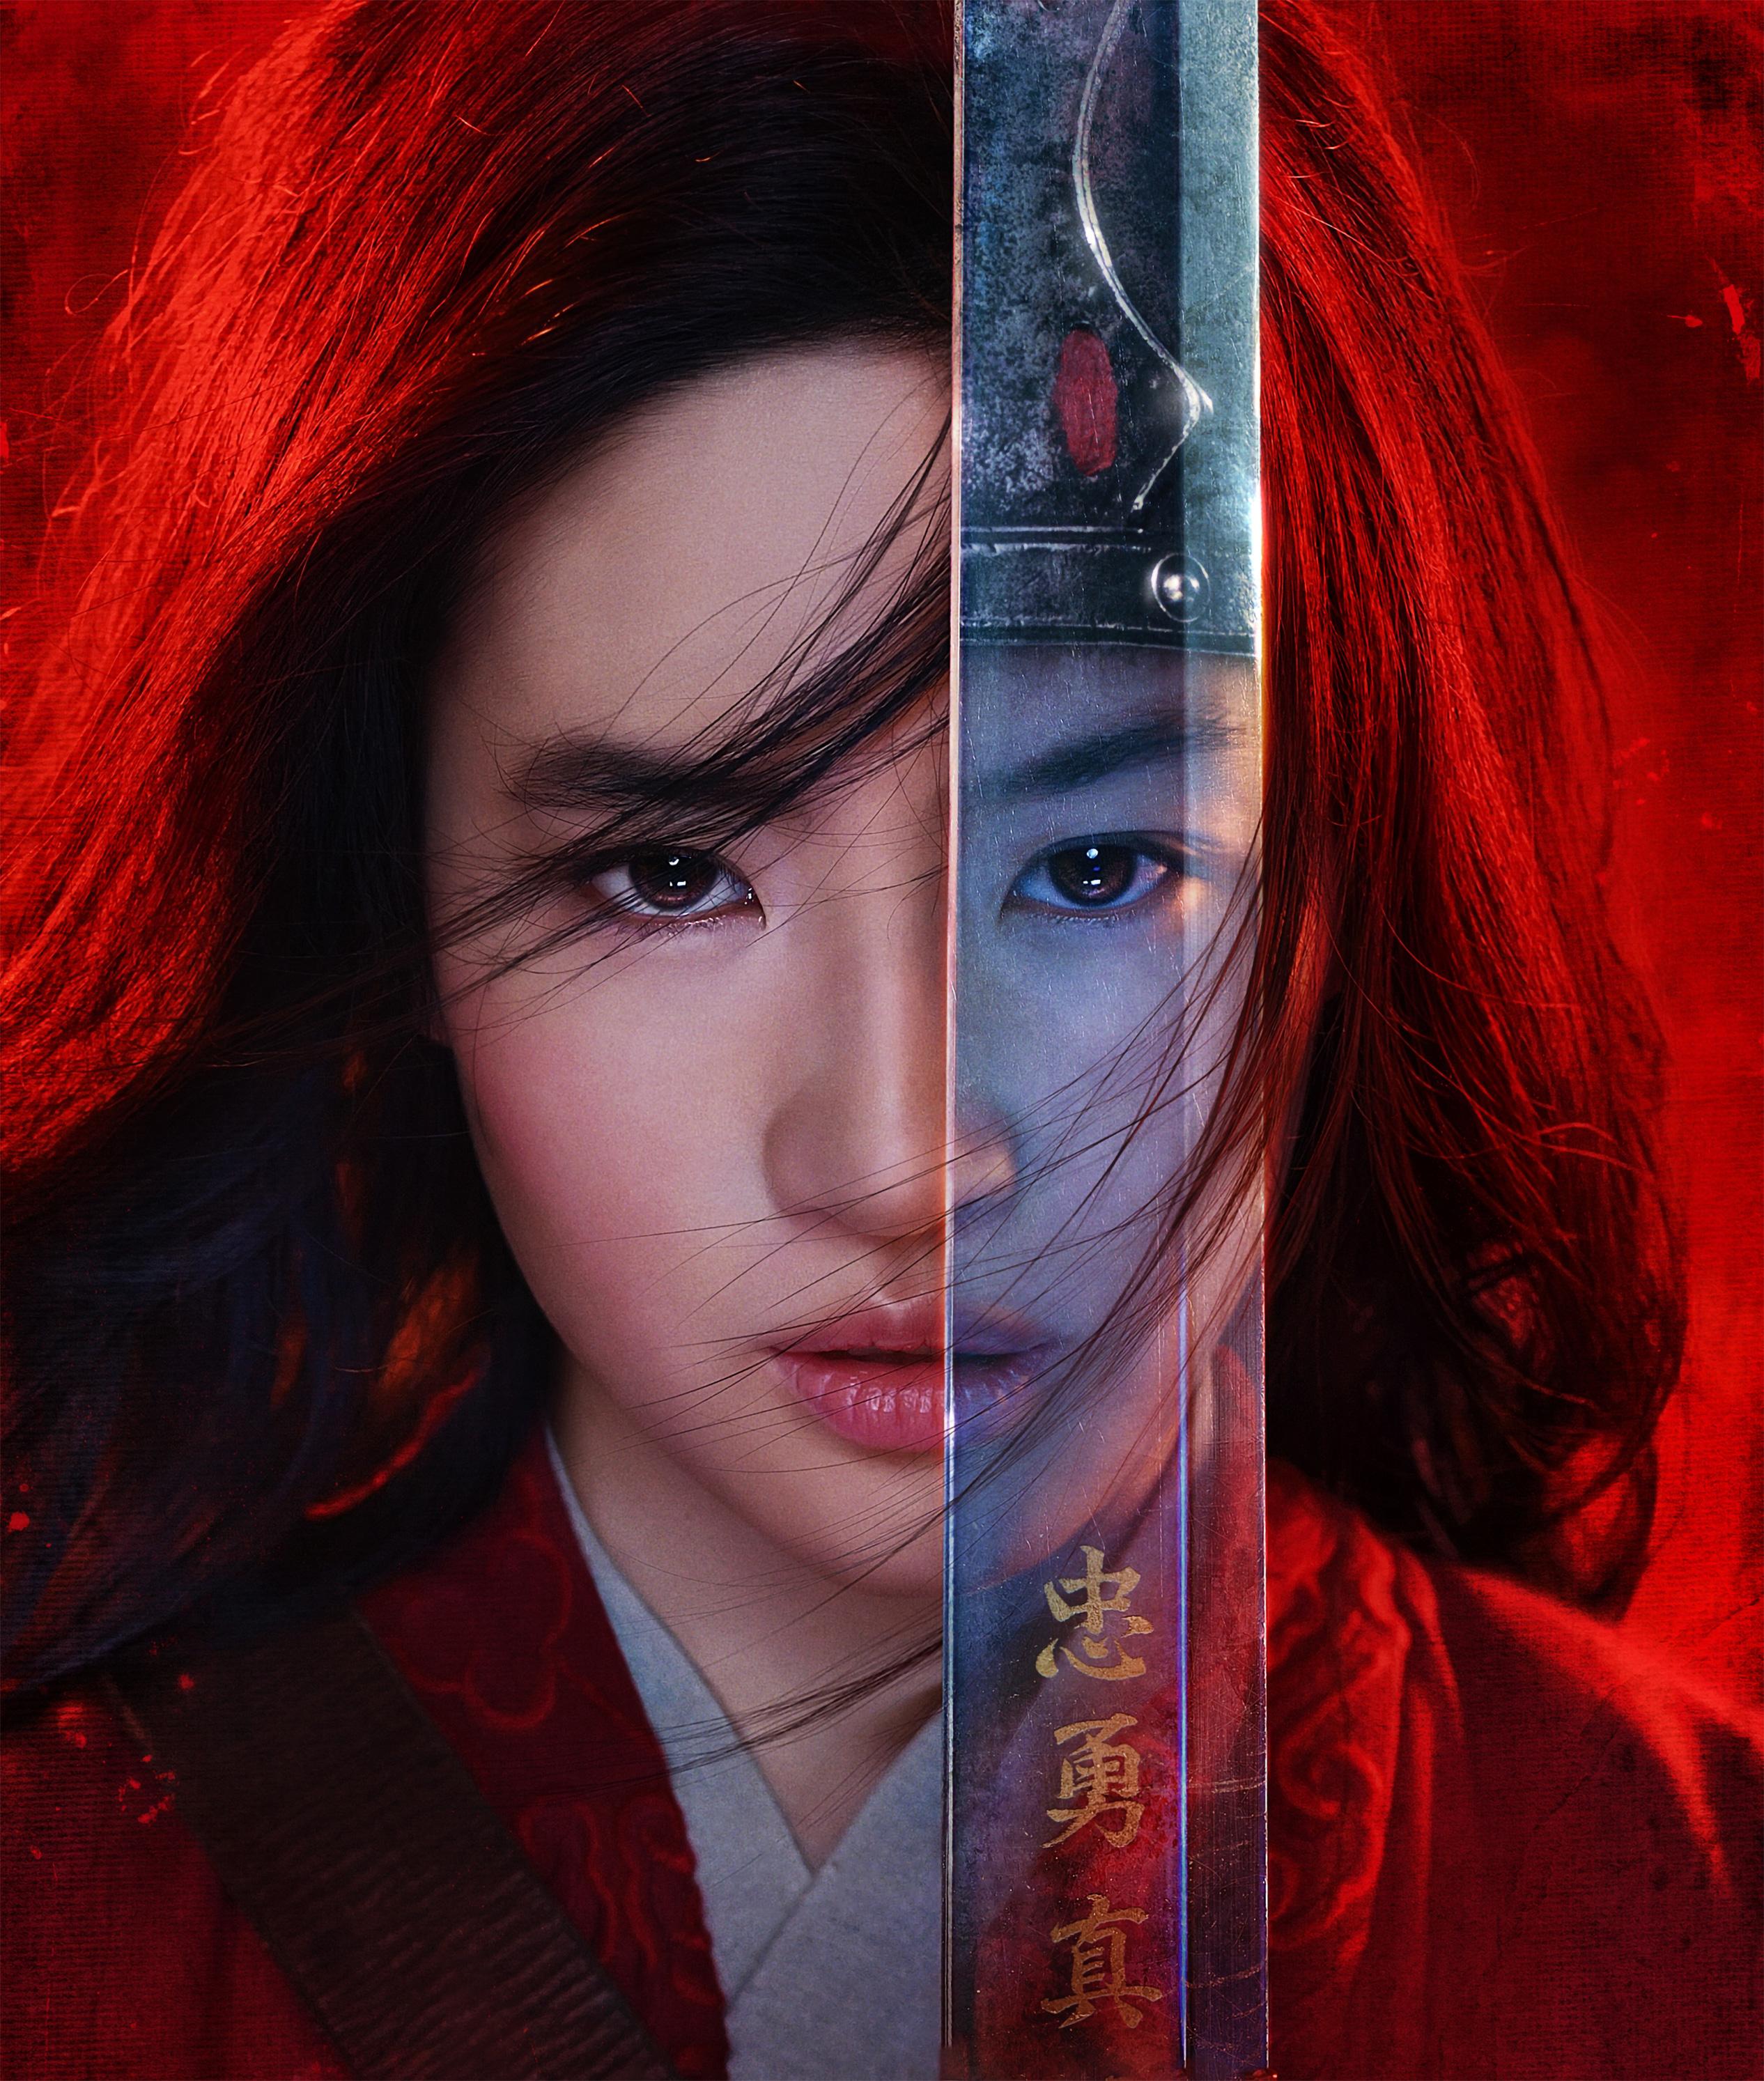 Mulan 2020 Movie Poster Wallpaper HD Movies 4K Wallpapers Images 2532x2987